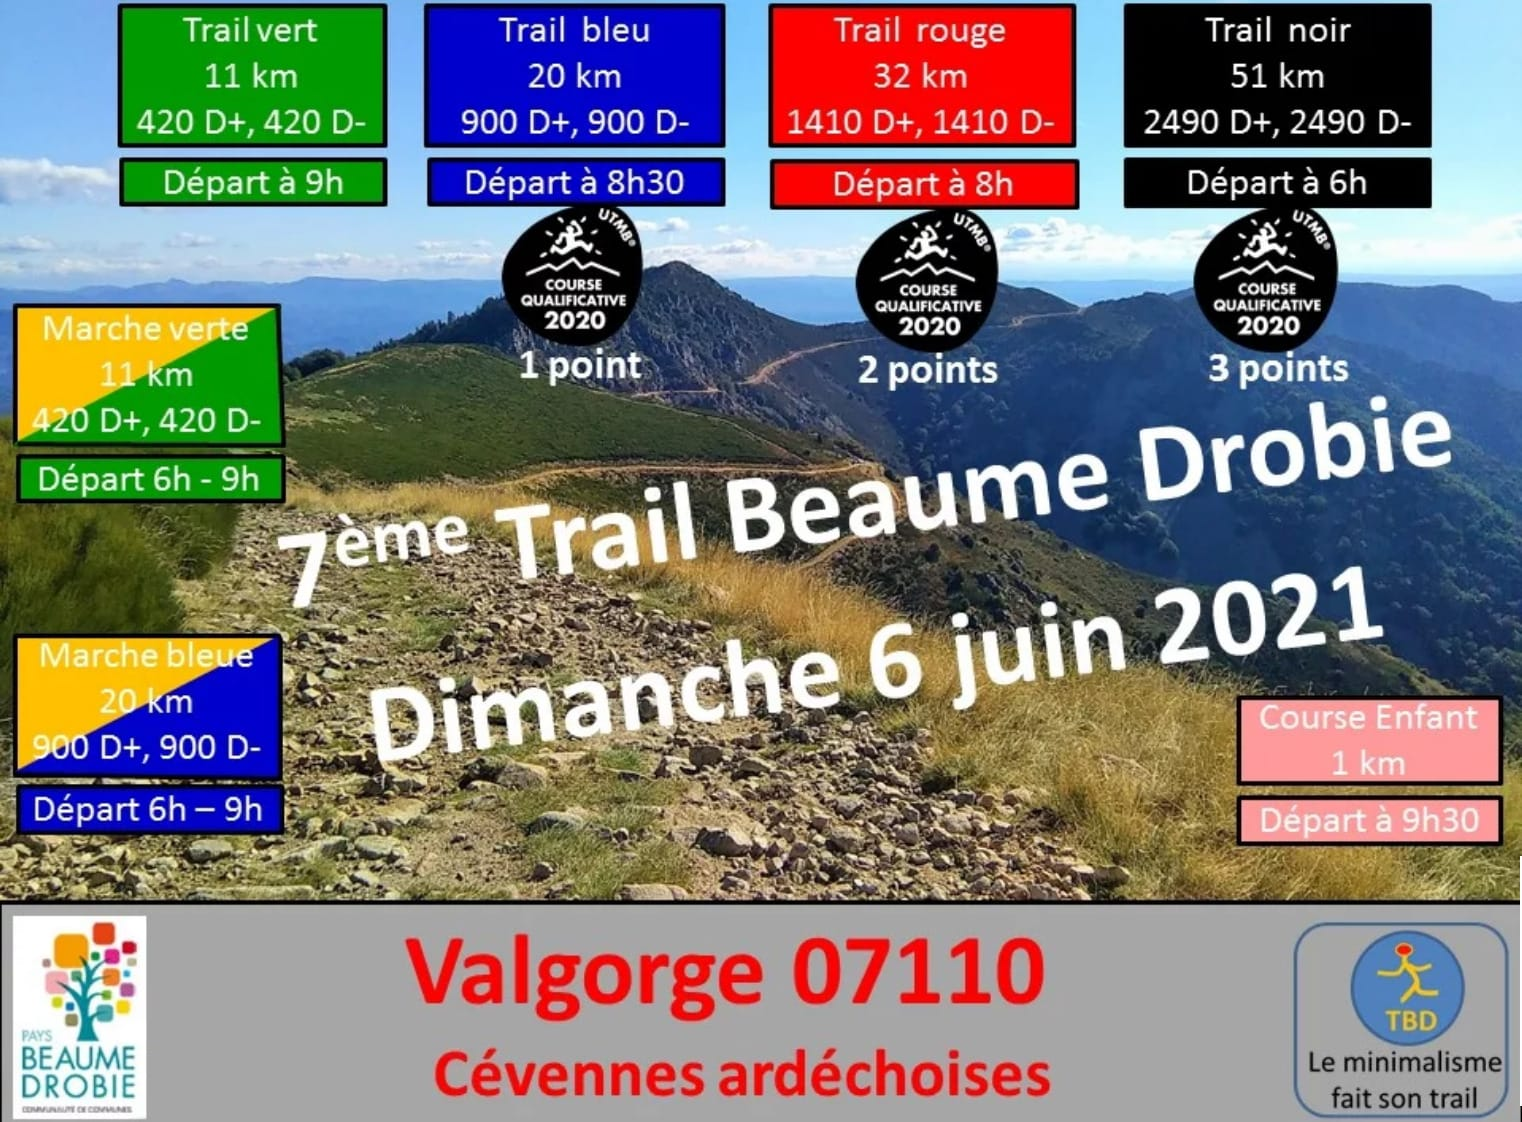 Trail-Beaume-Drobie-2021